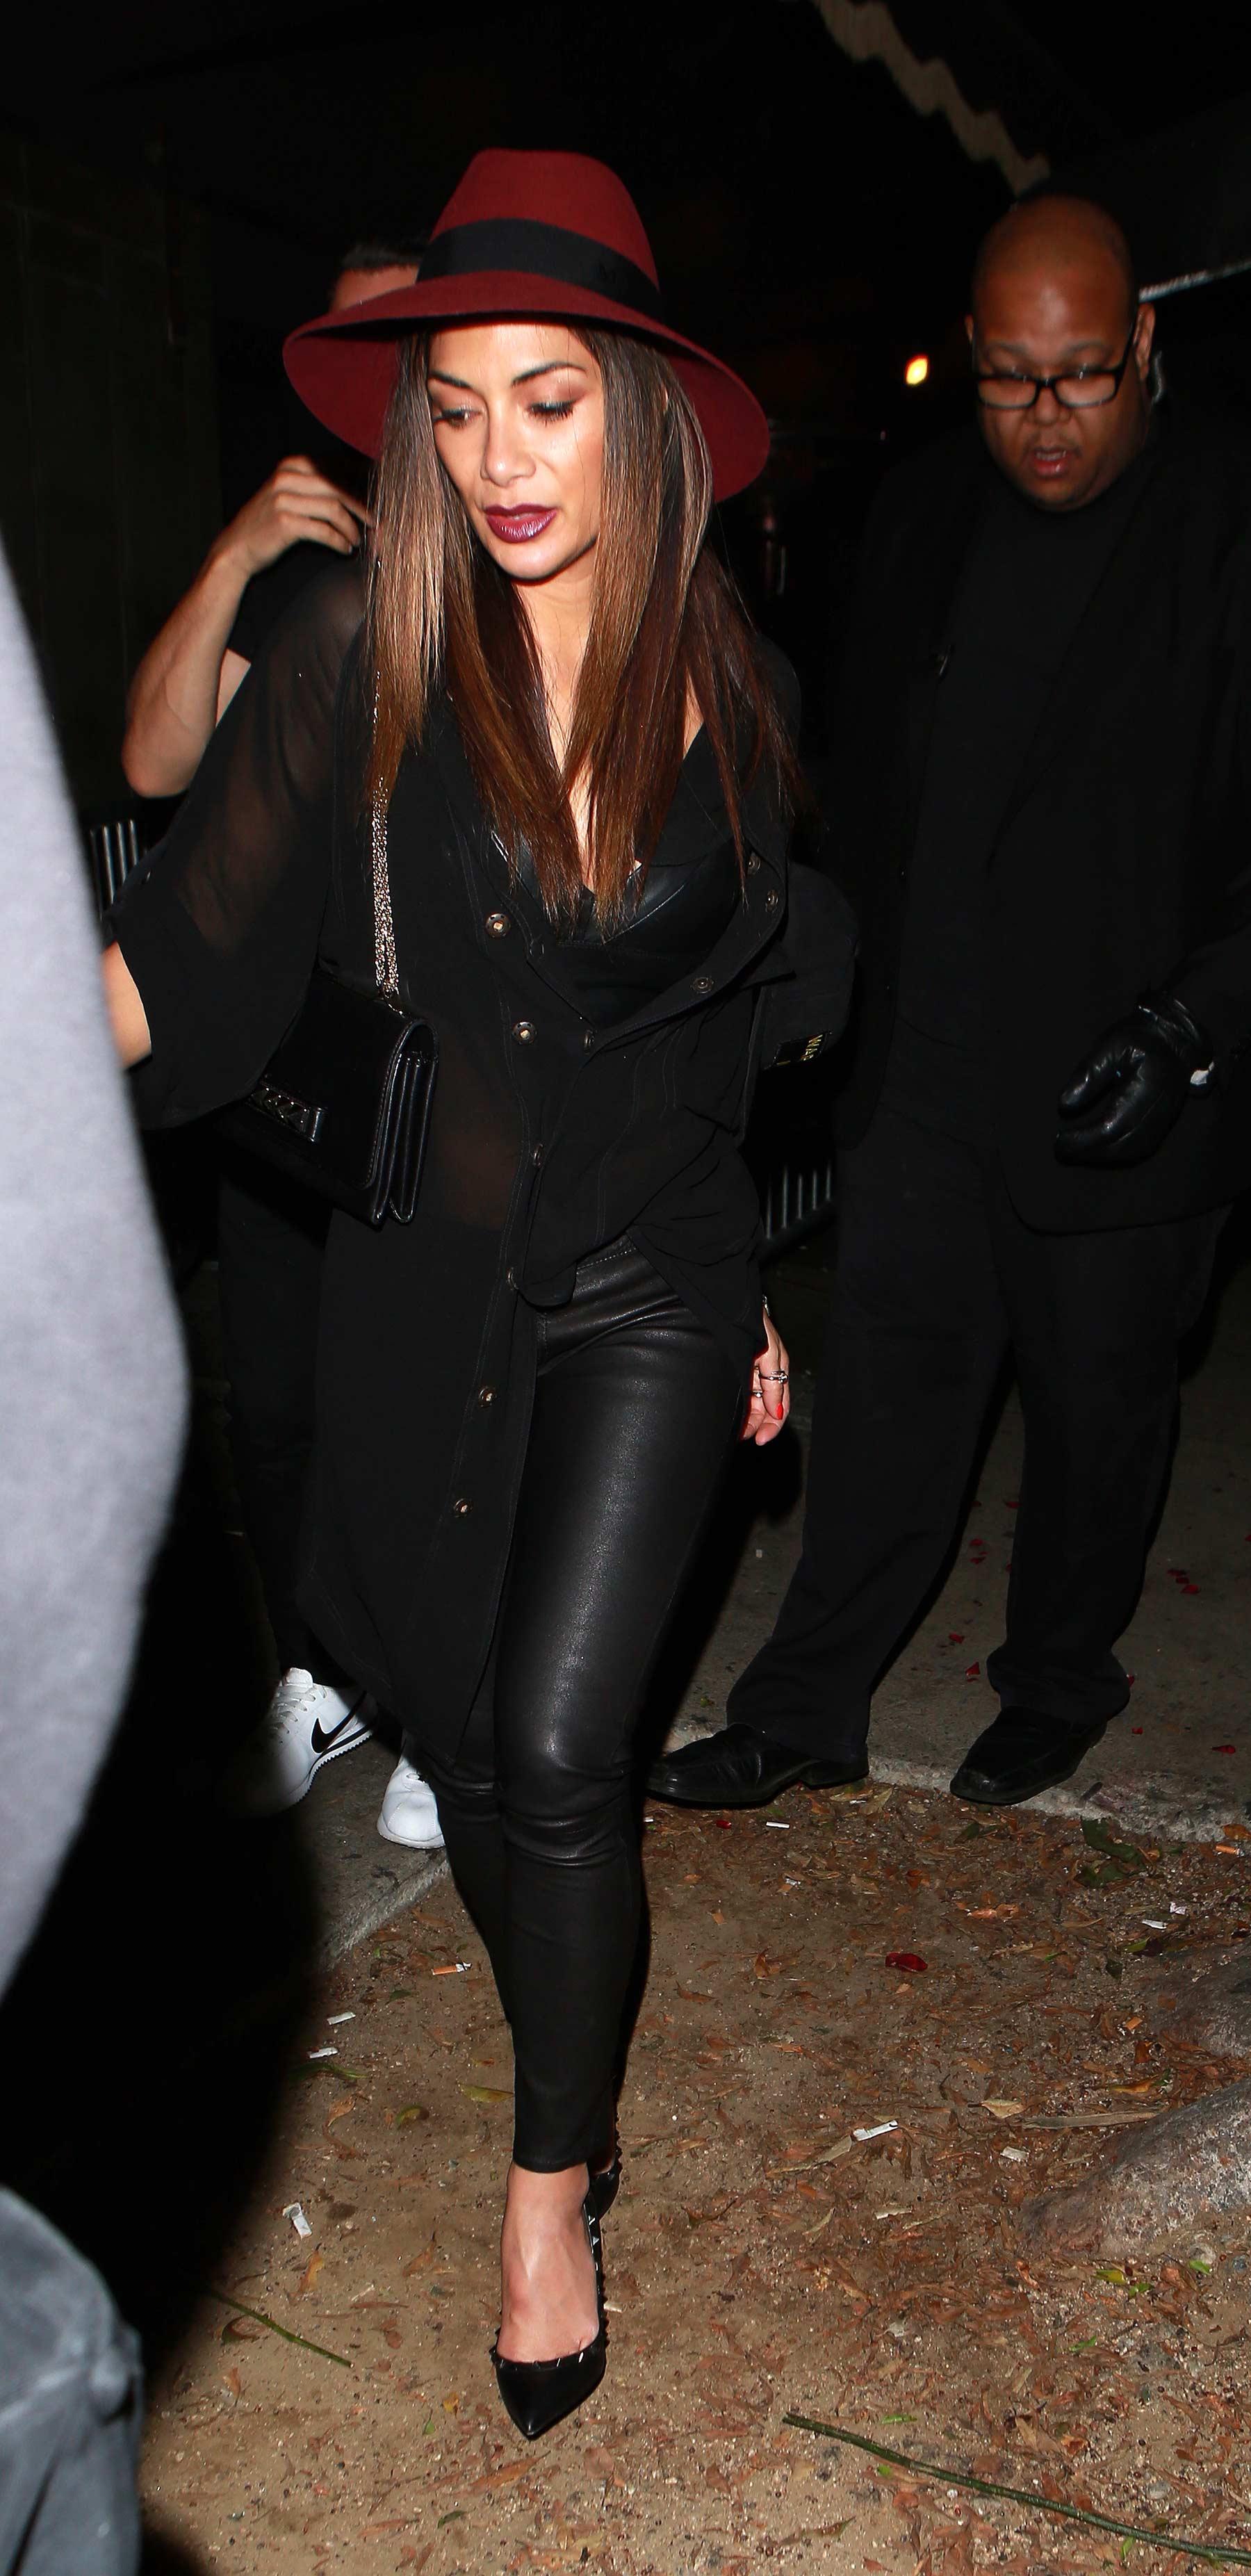 Nicole Scherzinger leaving Warwick Night Club